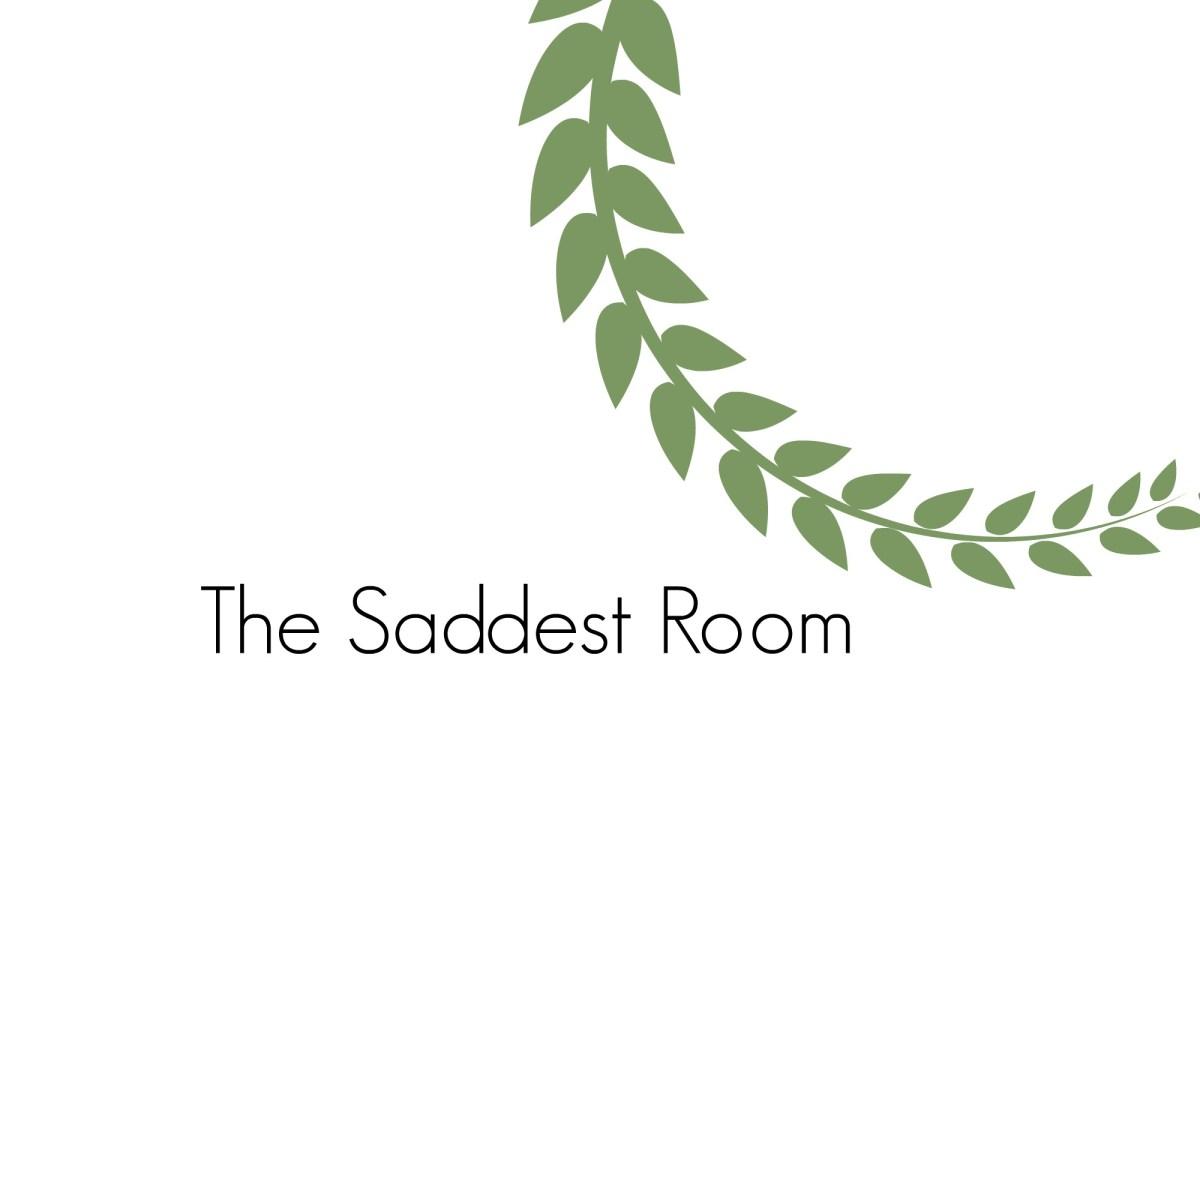 The Saddest Room